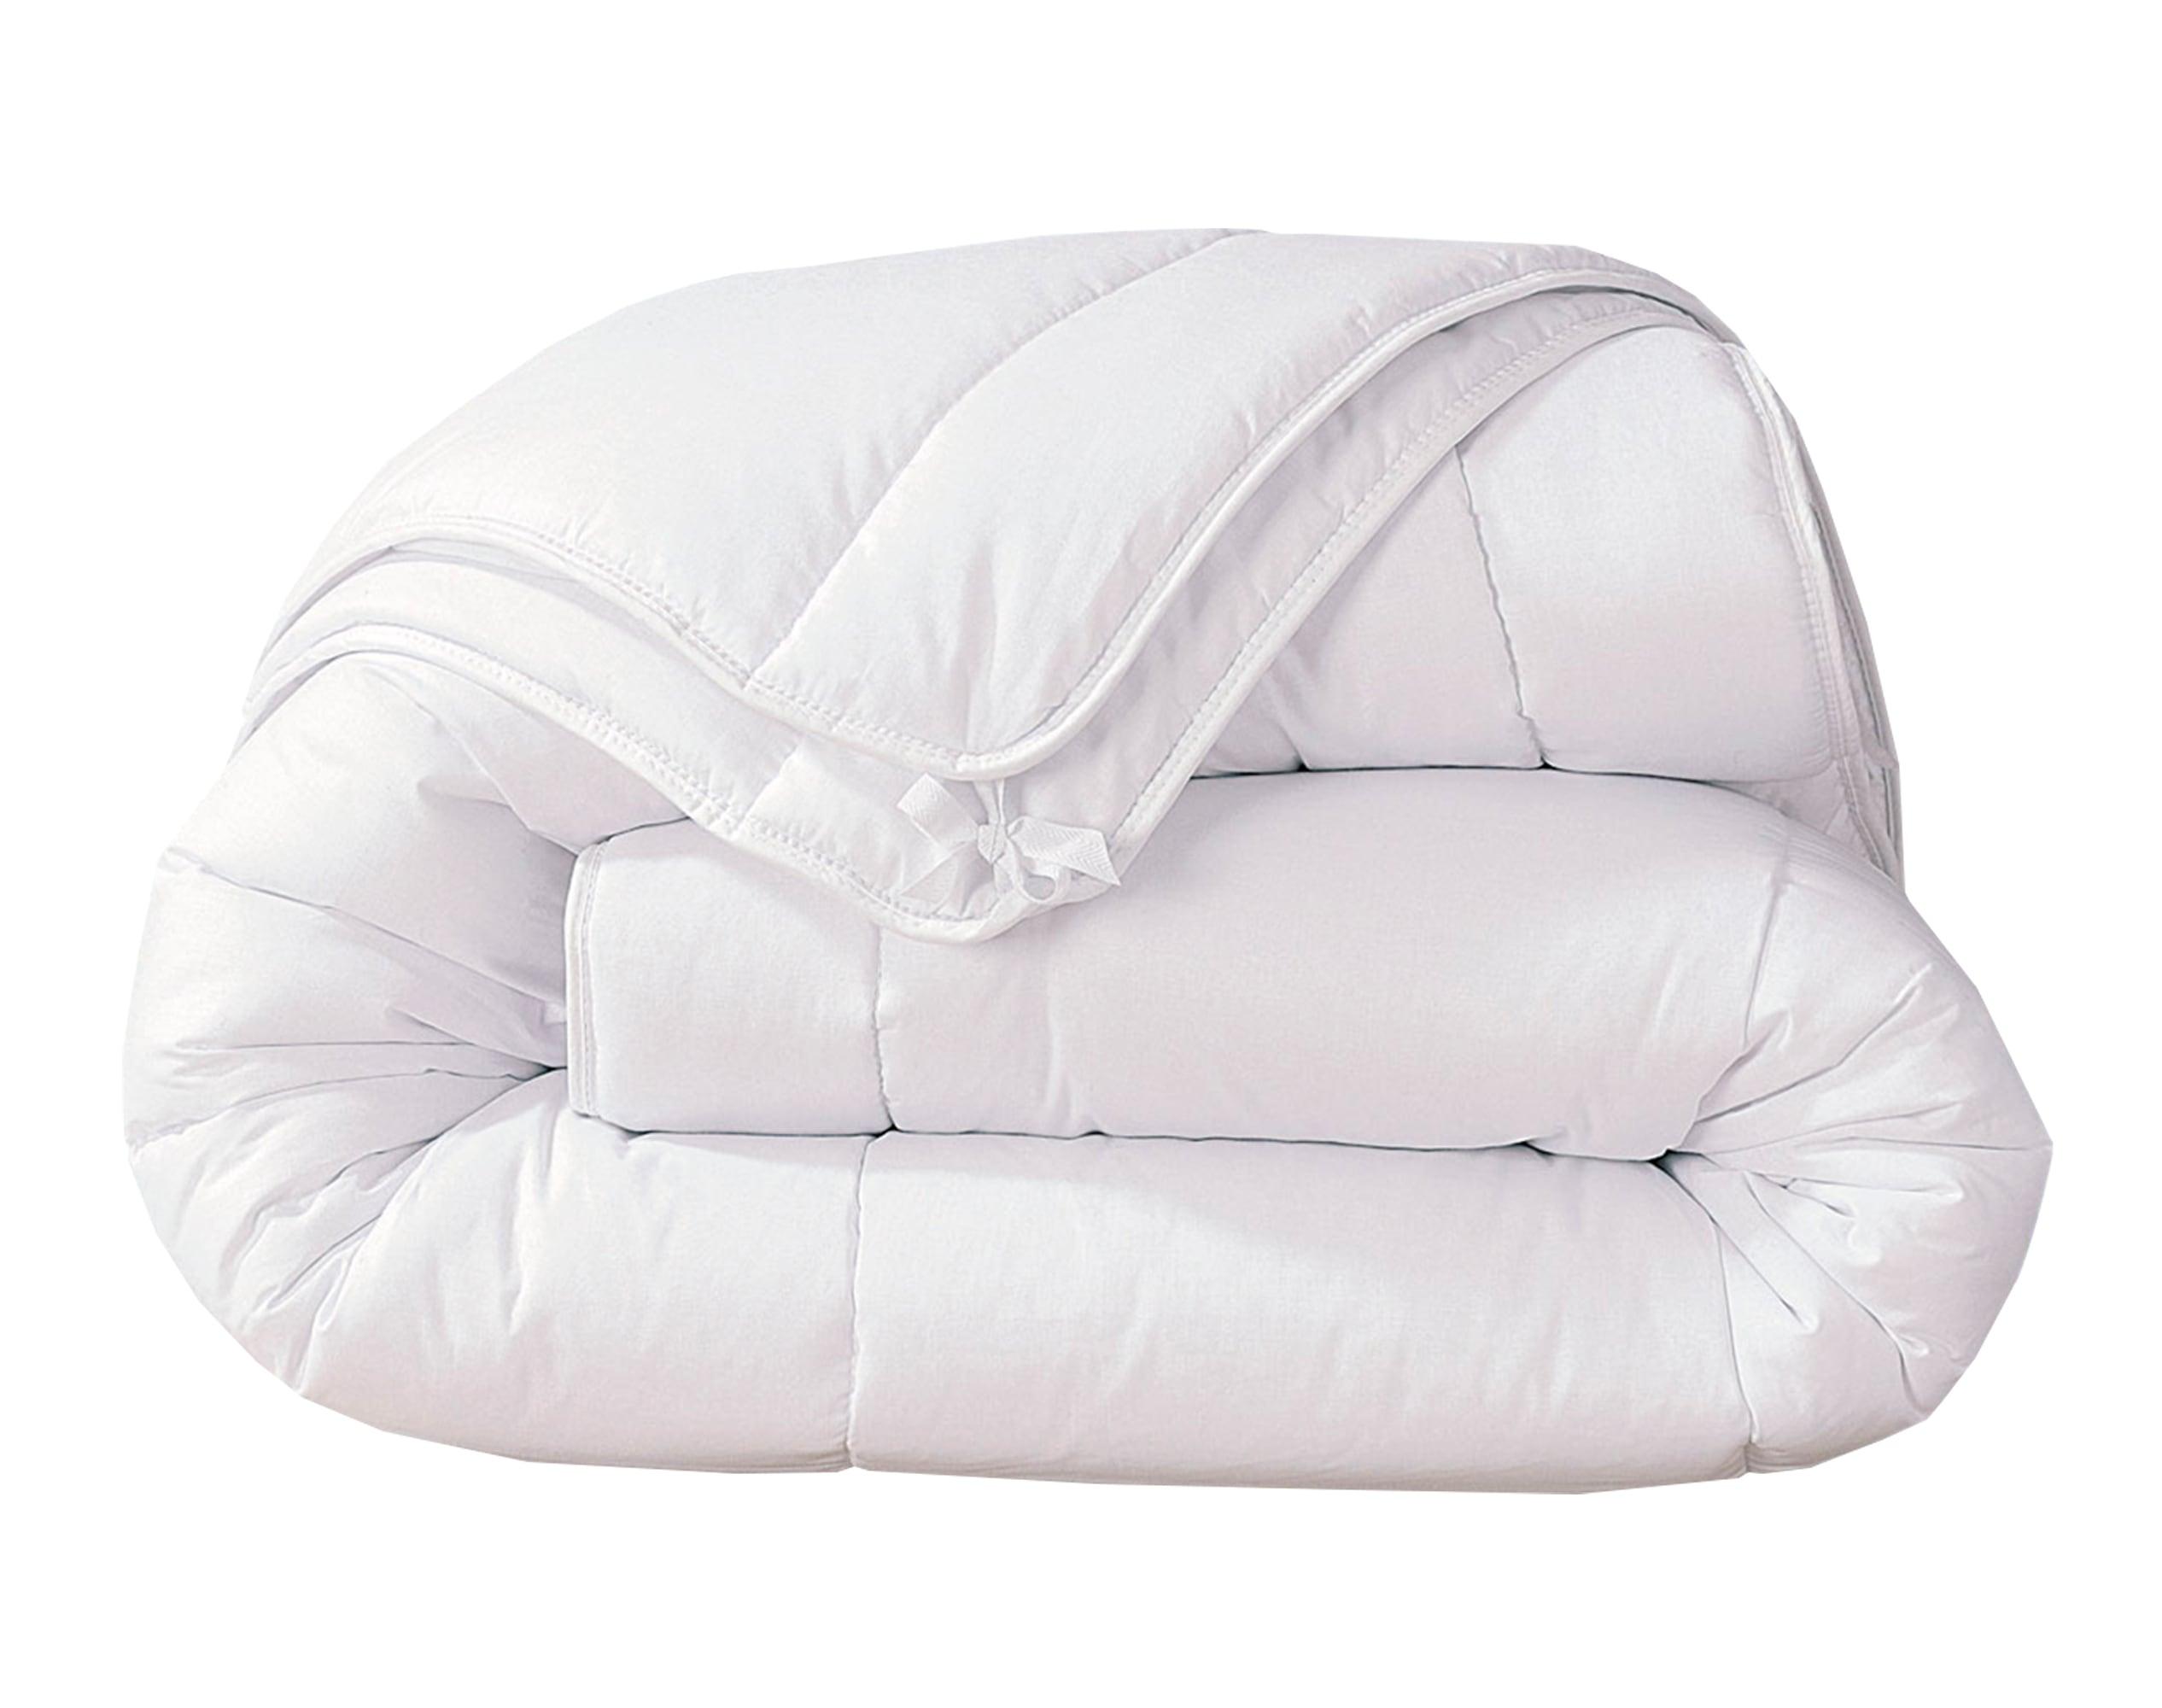 Couette 4 saisons 240x220 blanche en polyester 200+300 g/m²